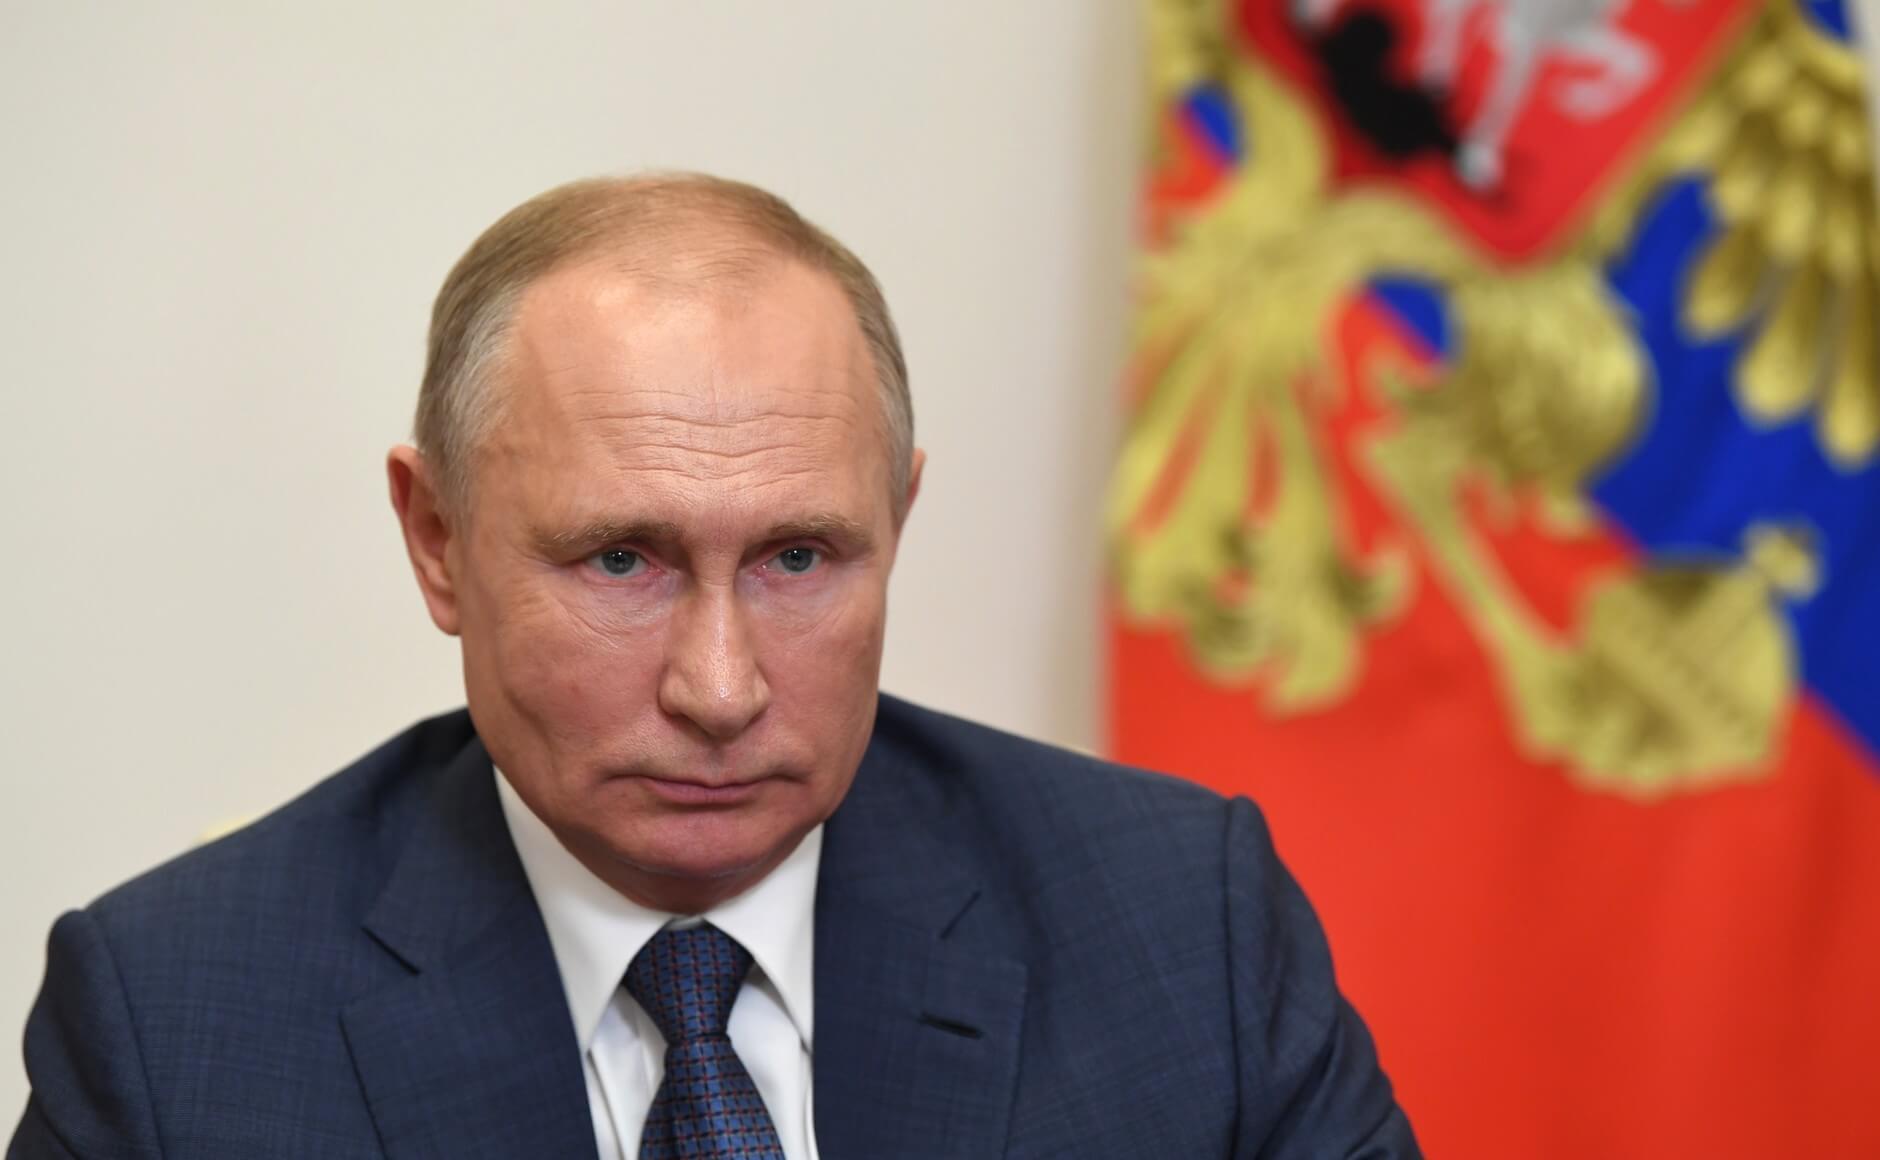 Kremlin Pool/Globallookpress